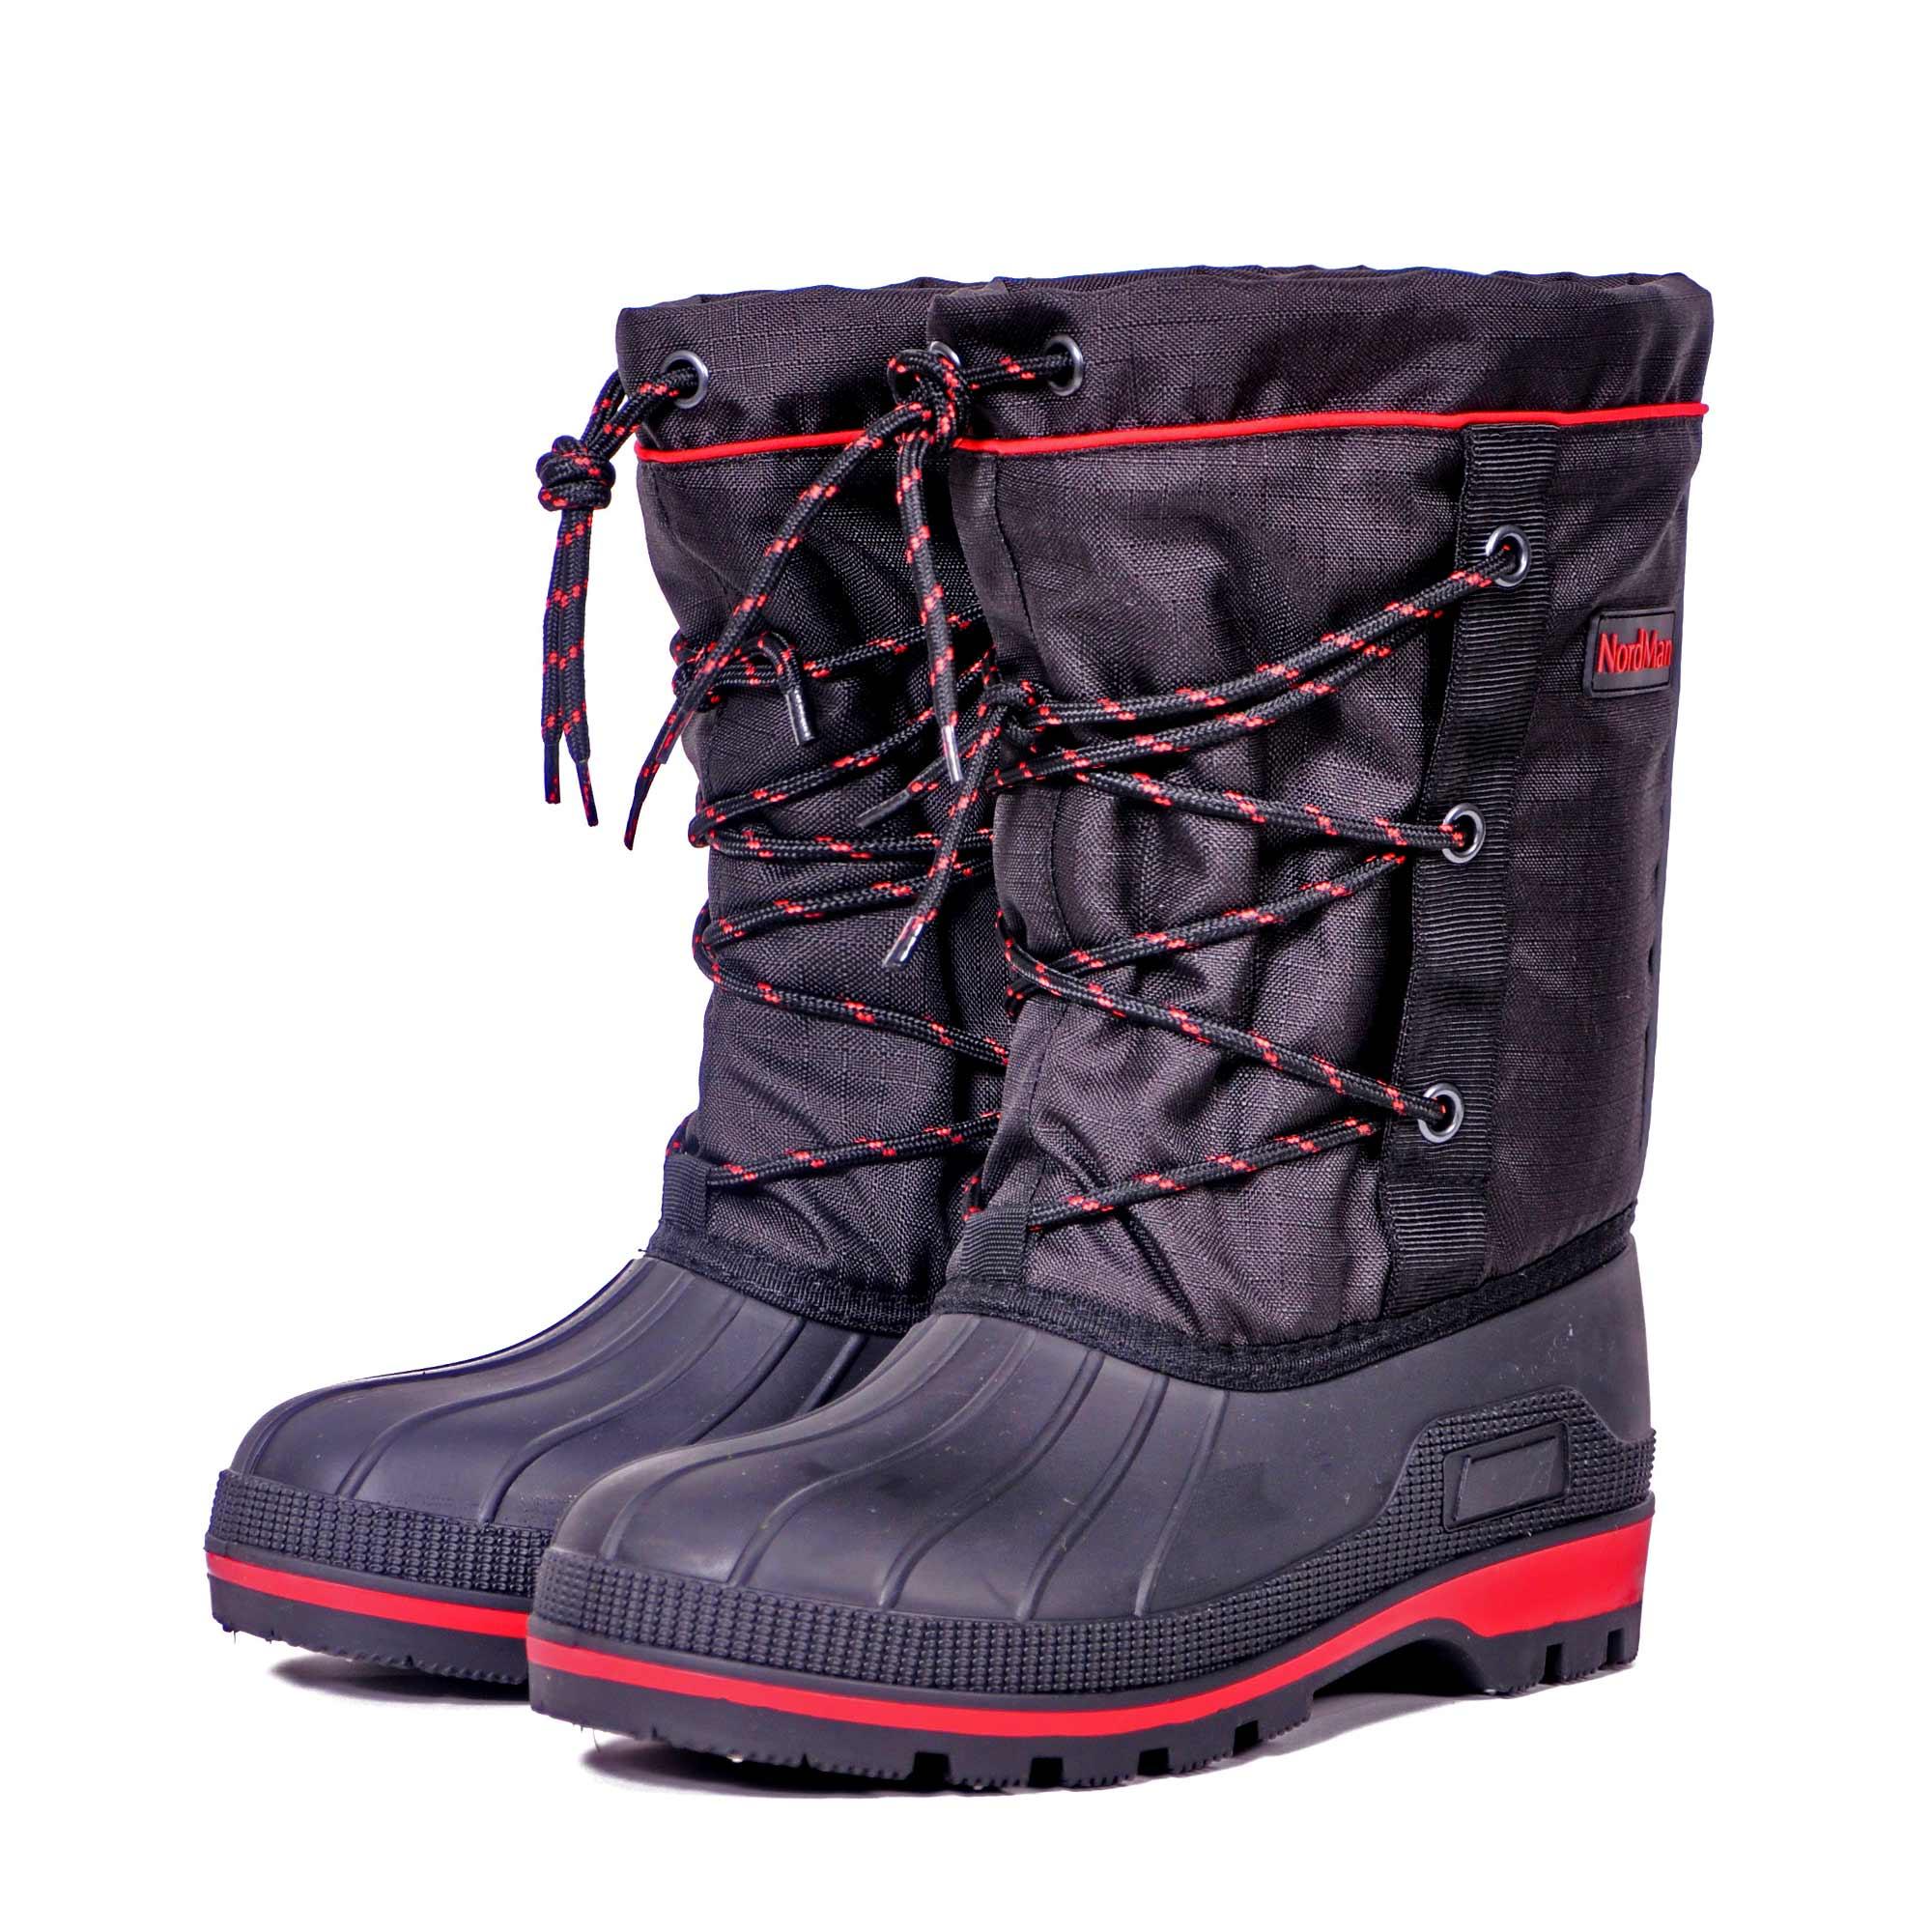 Бахилы для охотников из ТЭП Nordman New Red (шнурки) ОХ-14 О 2.14, Бахилы - арт. 1123730367